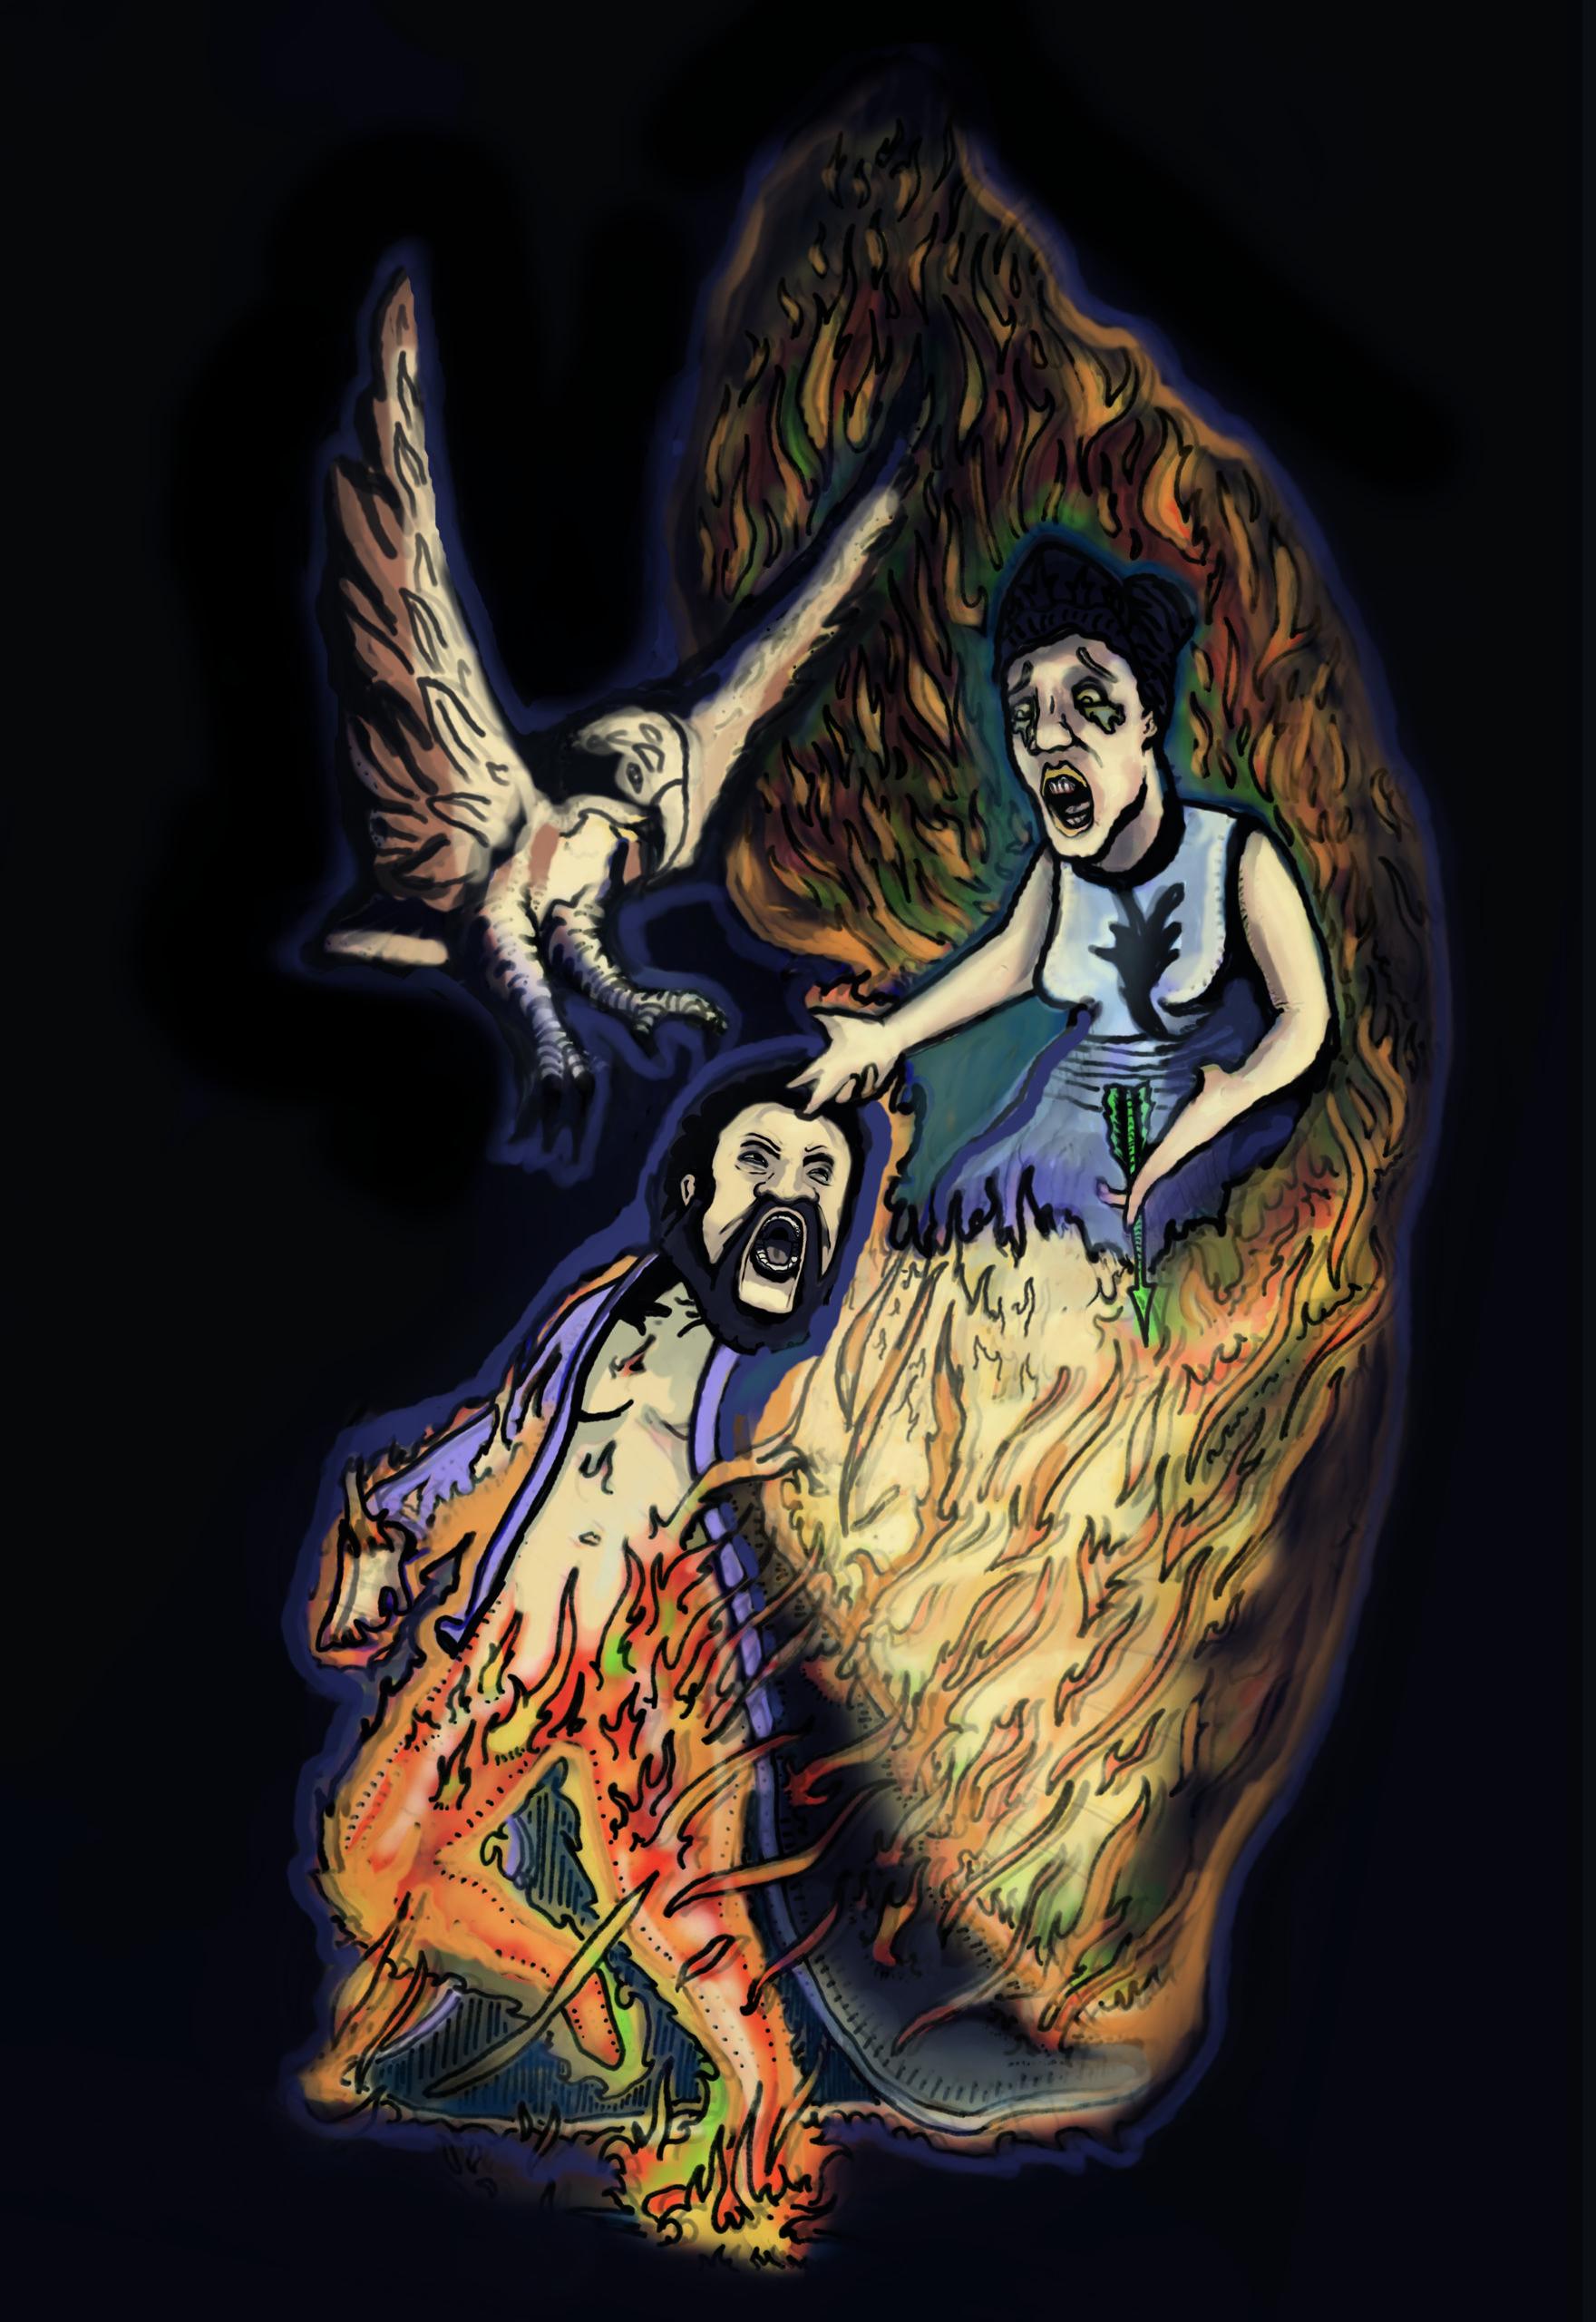 Hercules student artwork from MassArt, MacNab